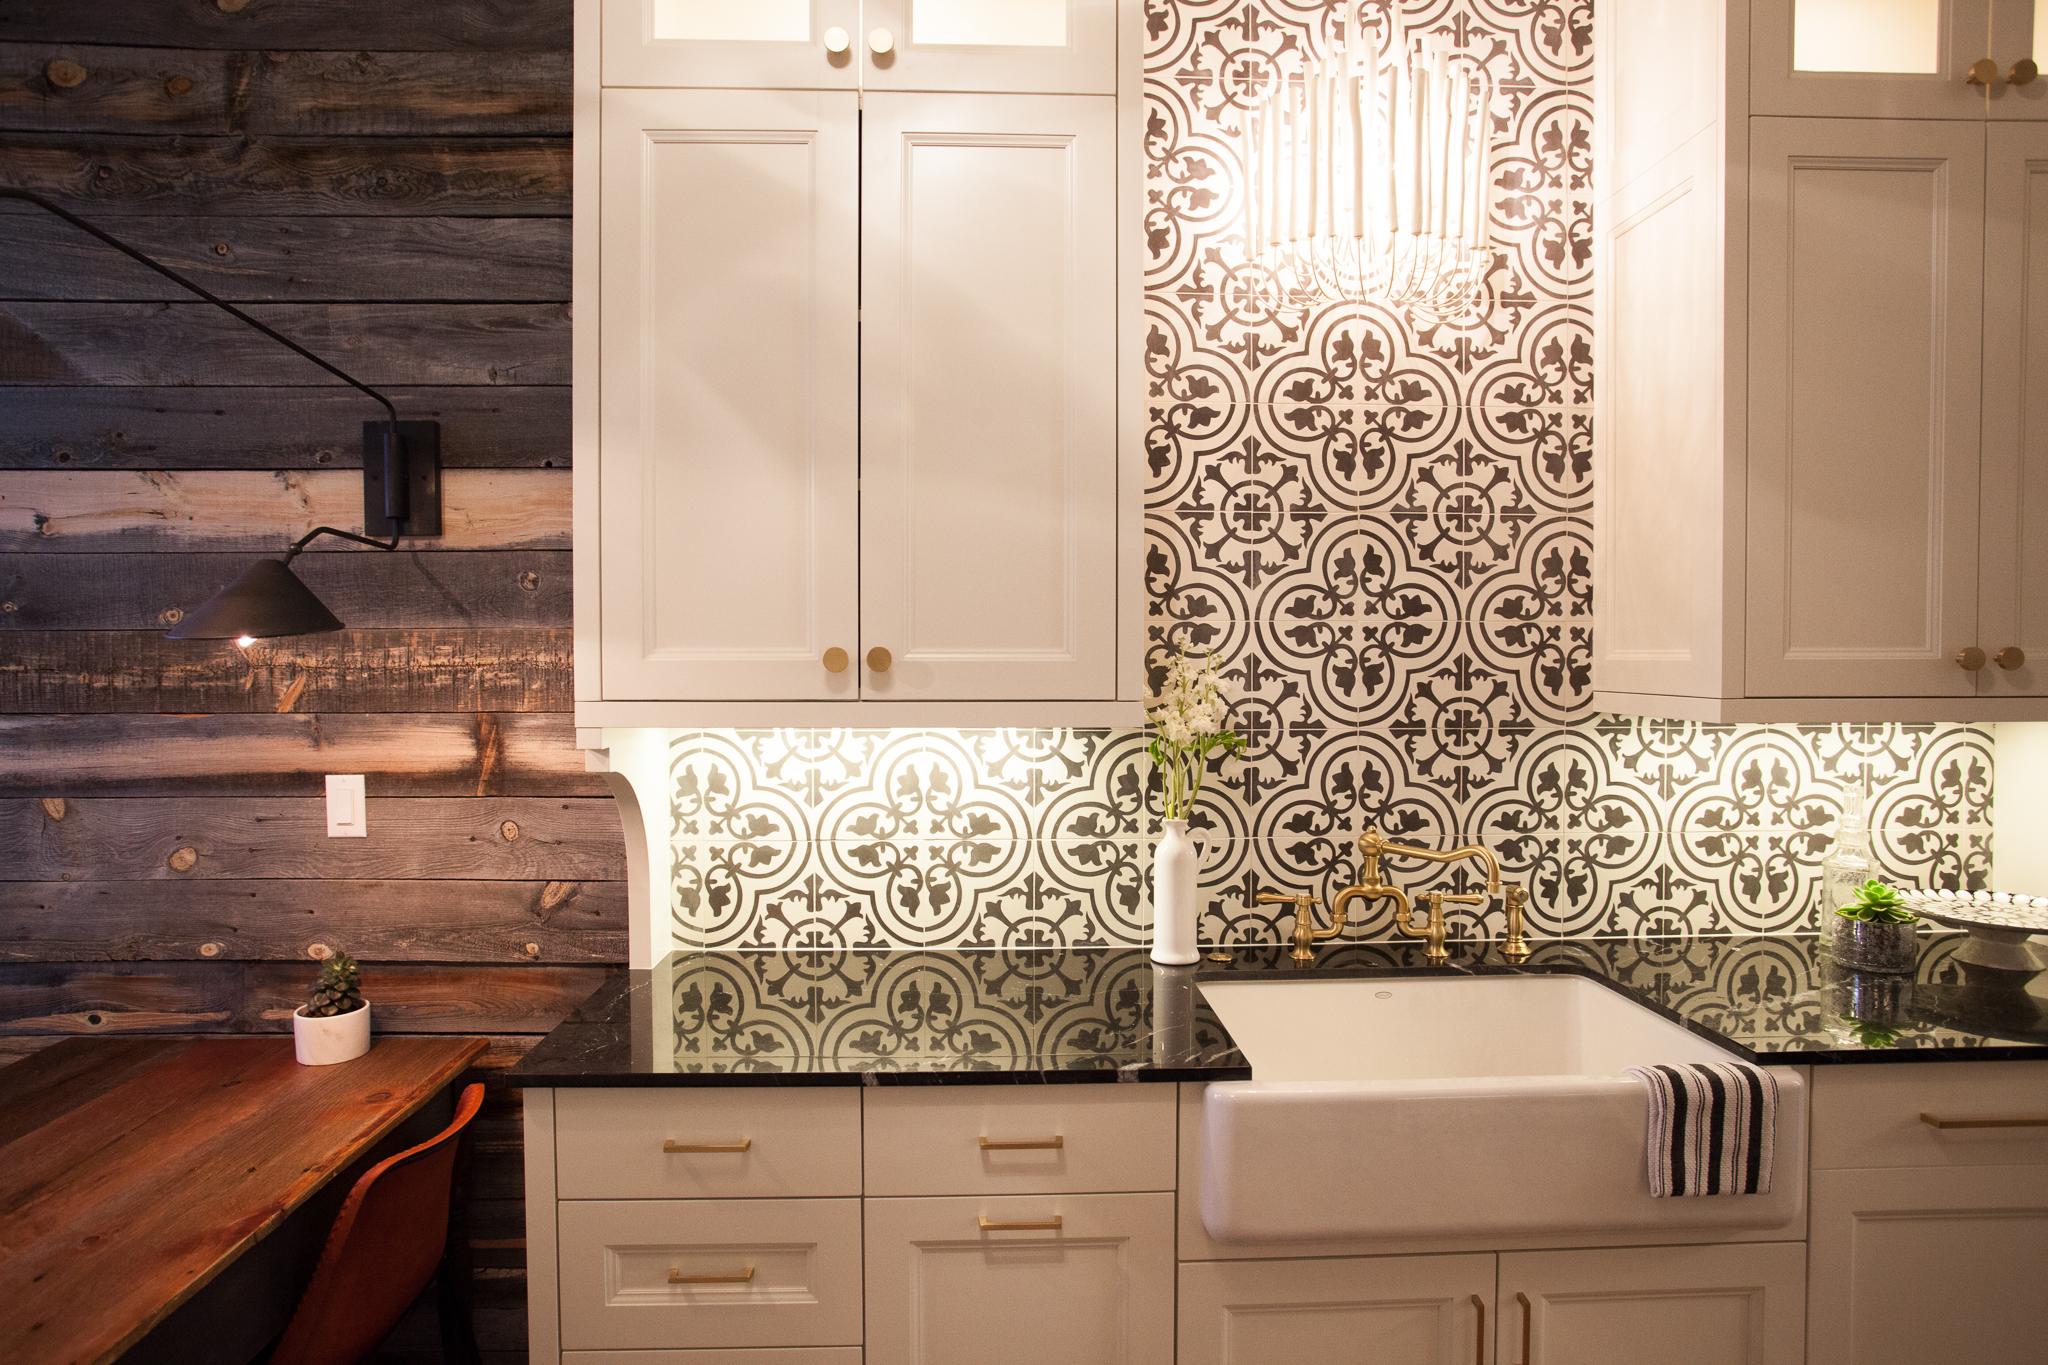 Aspen Leaf Kitchens Showroom-18